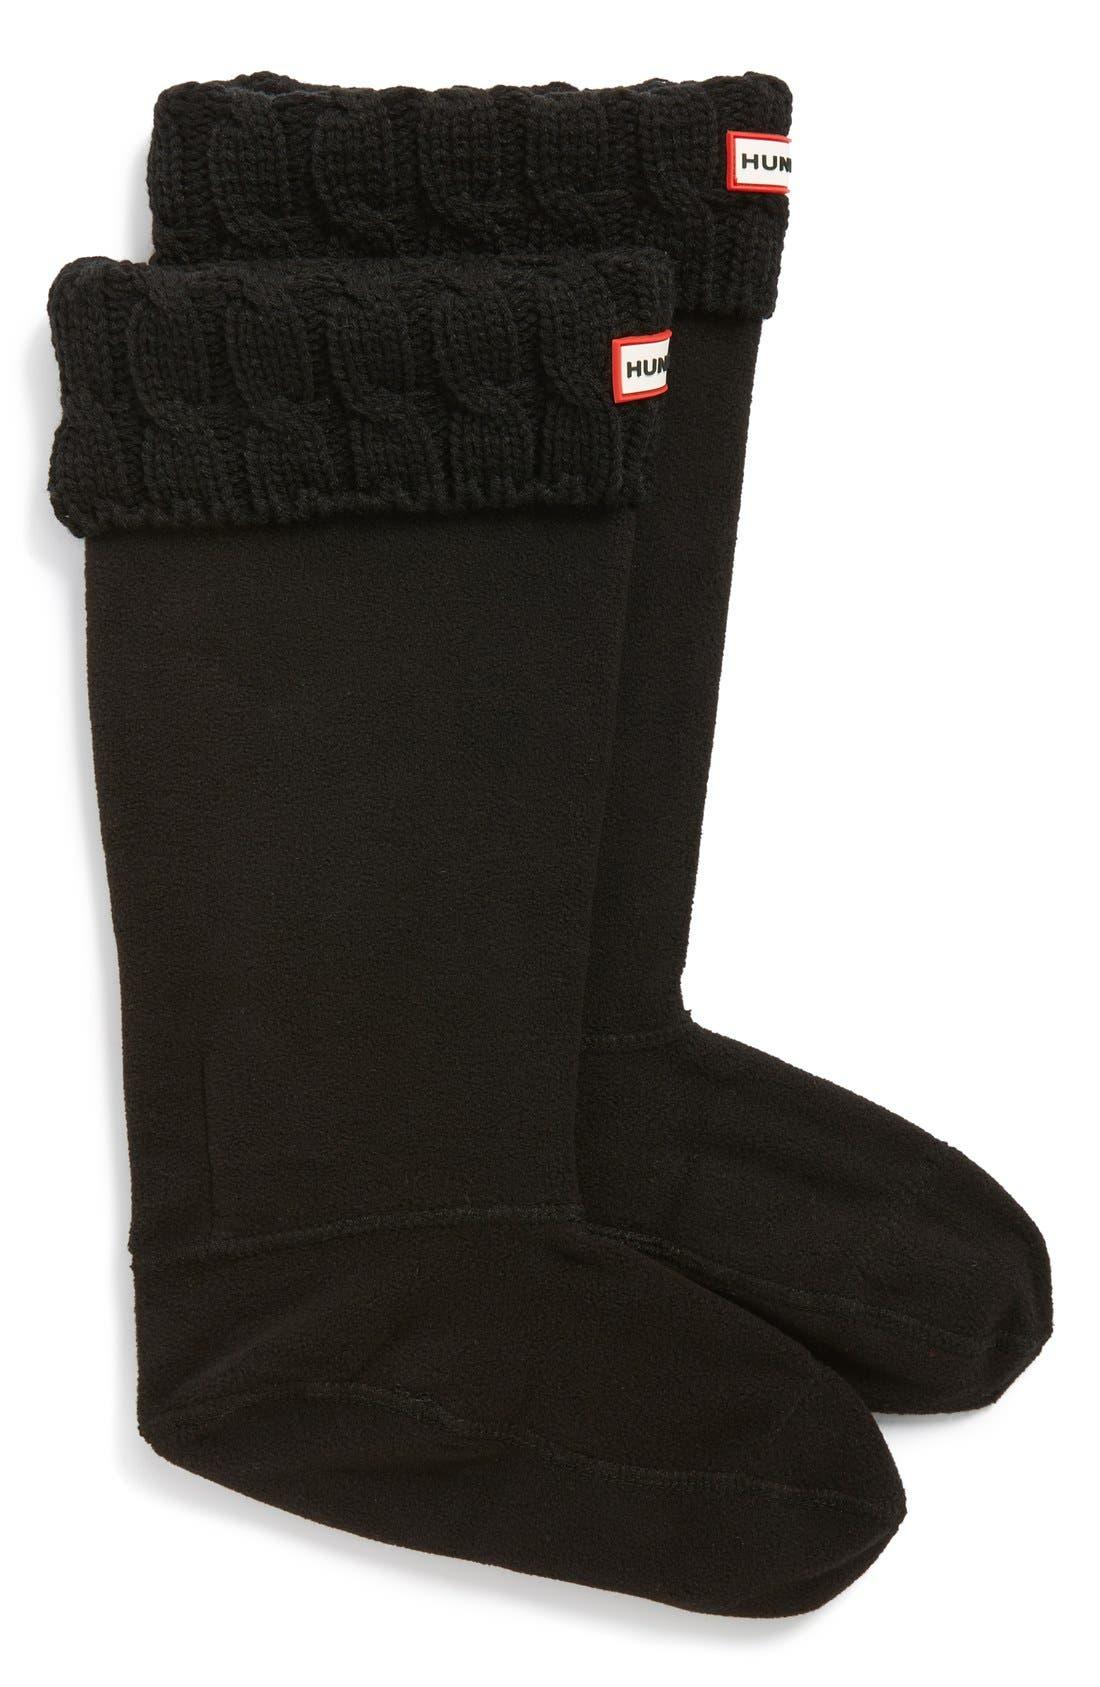 Hunter Original Tall Cable Knit Cuff Welly Boot Socks